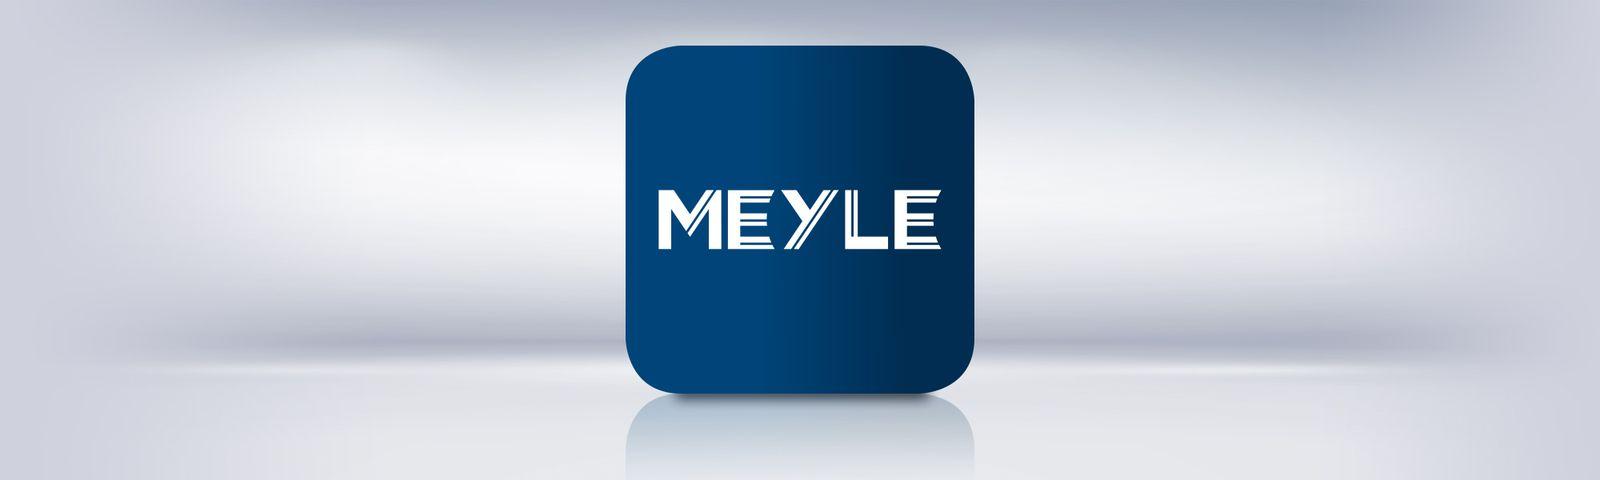 Meyle Uses Automechanika to Present New Brand Identity